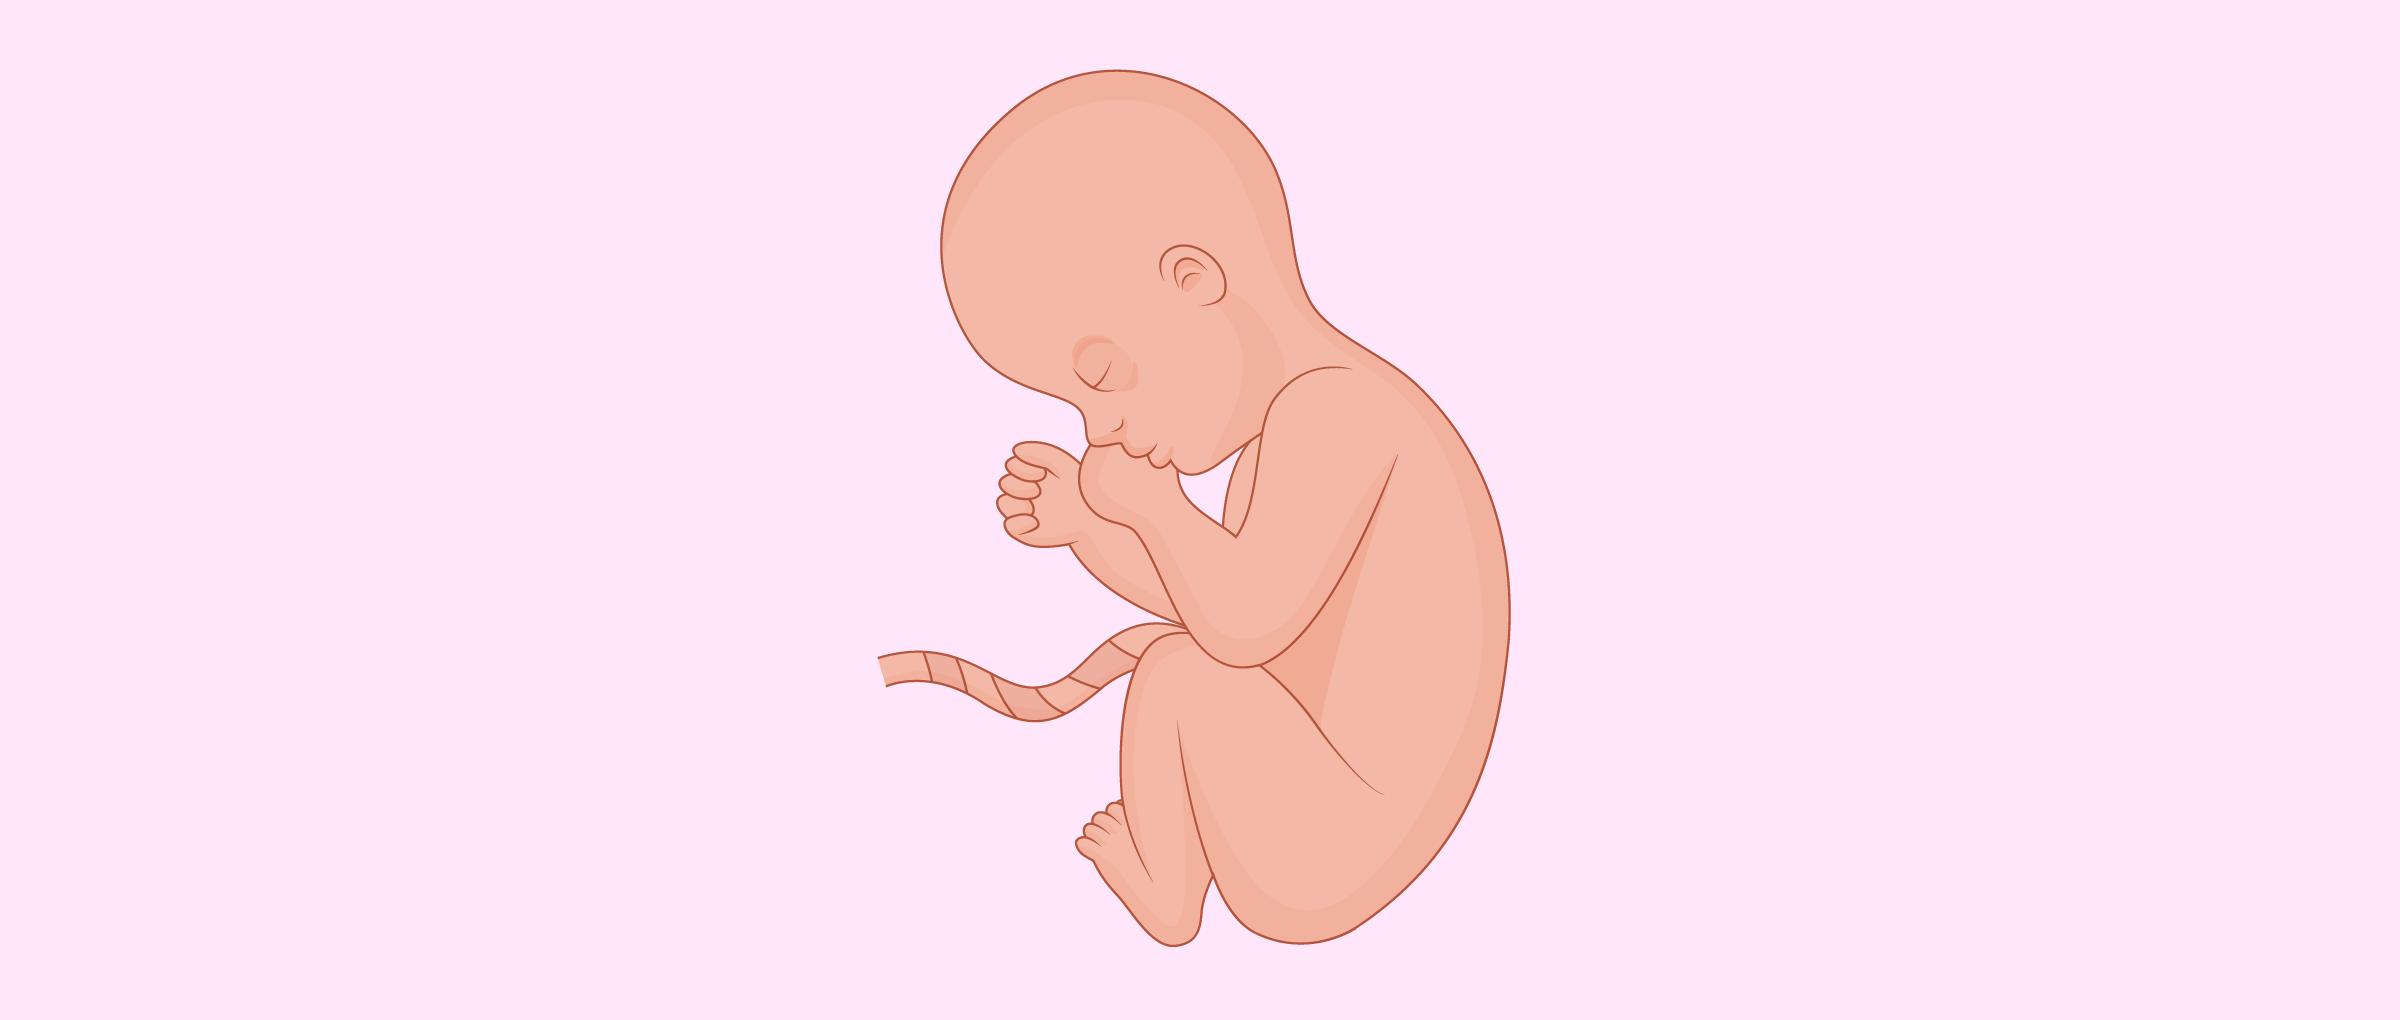 El octavo mes de embarazo